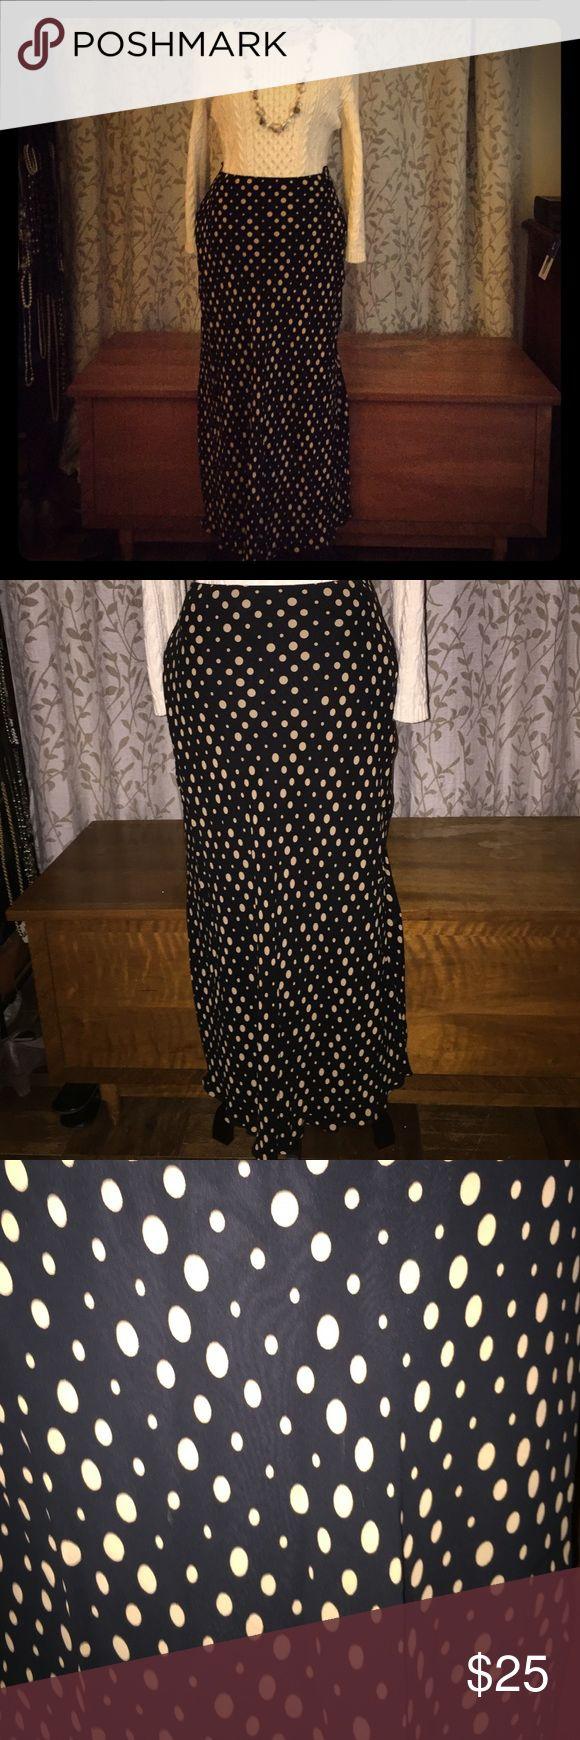 Marks & Spencer's, black and tan polkadot skirt. Fully lined midi skirt with elastic waistband. marks and spencer's Skirts Midi